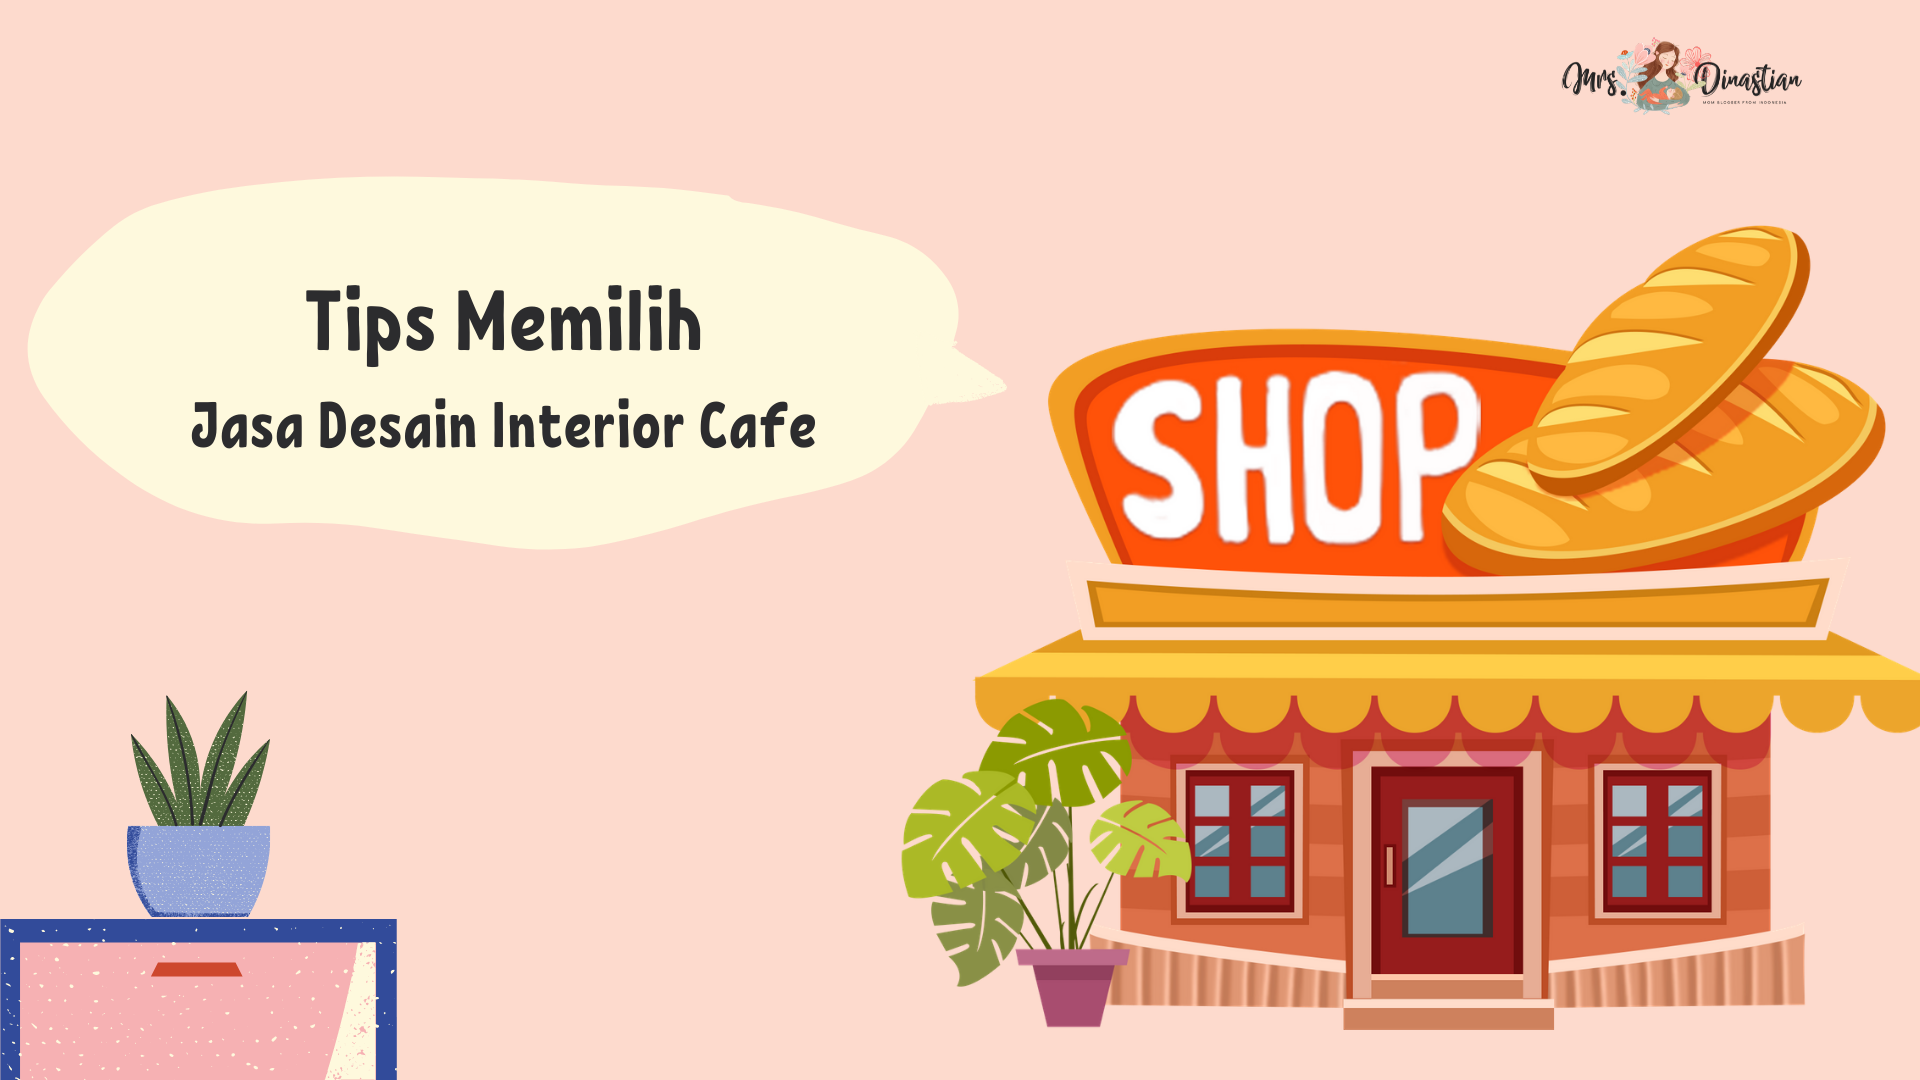 Tips Memilih Jasa Desain Interior Cafe